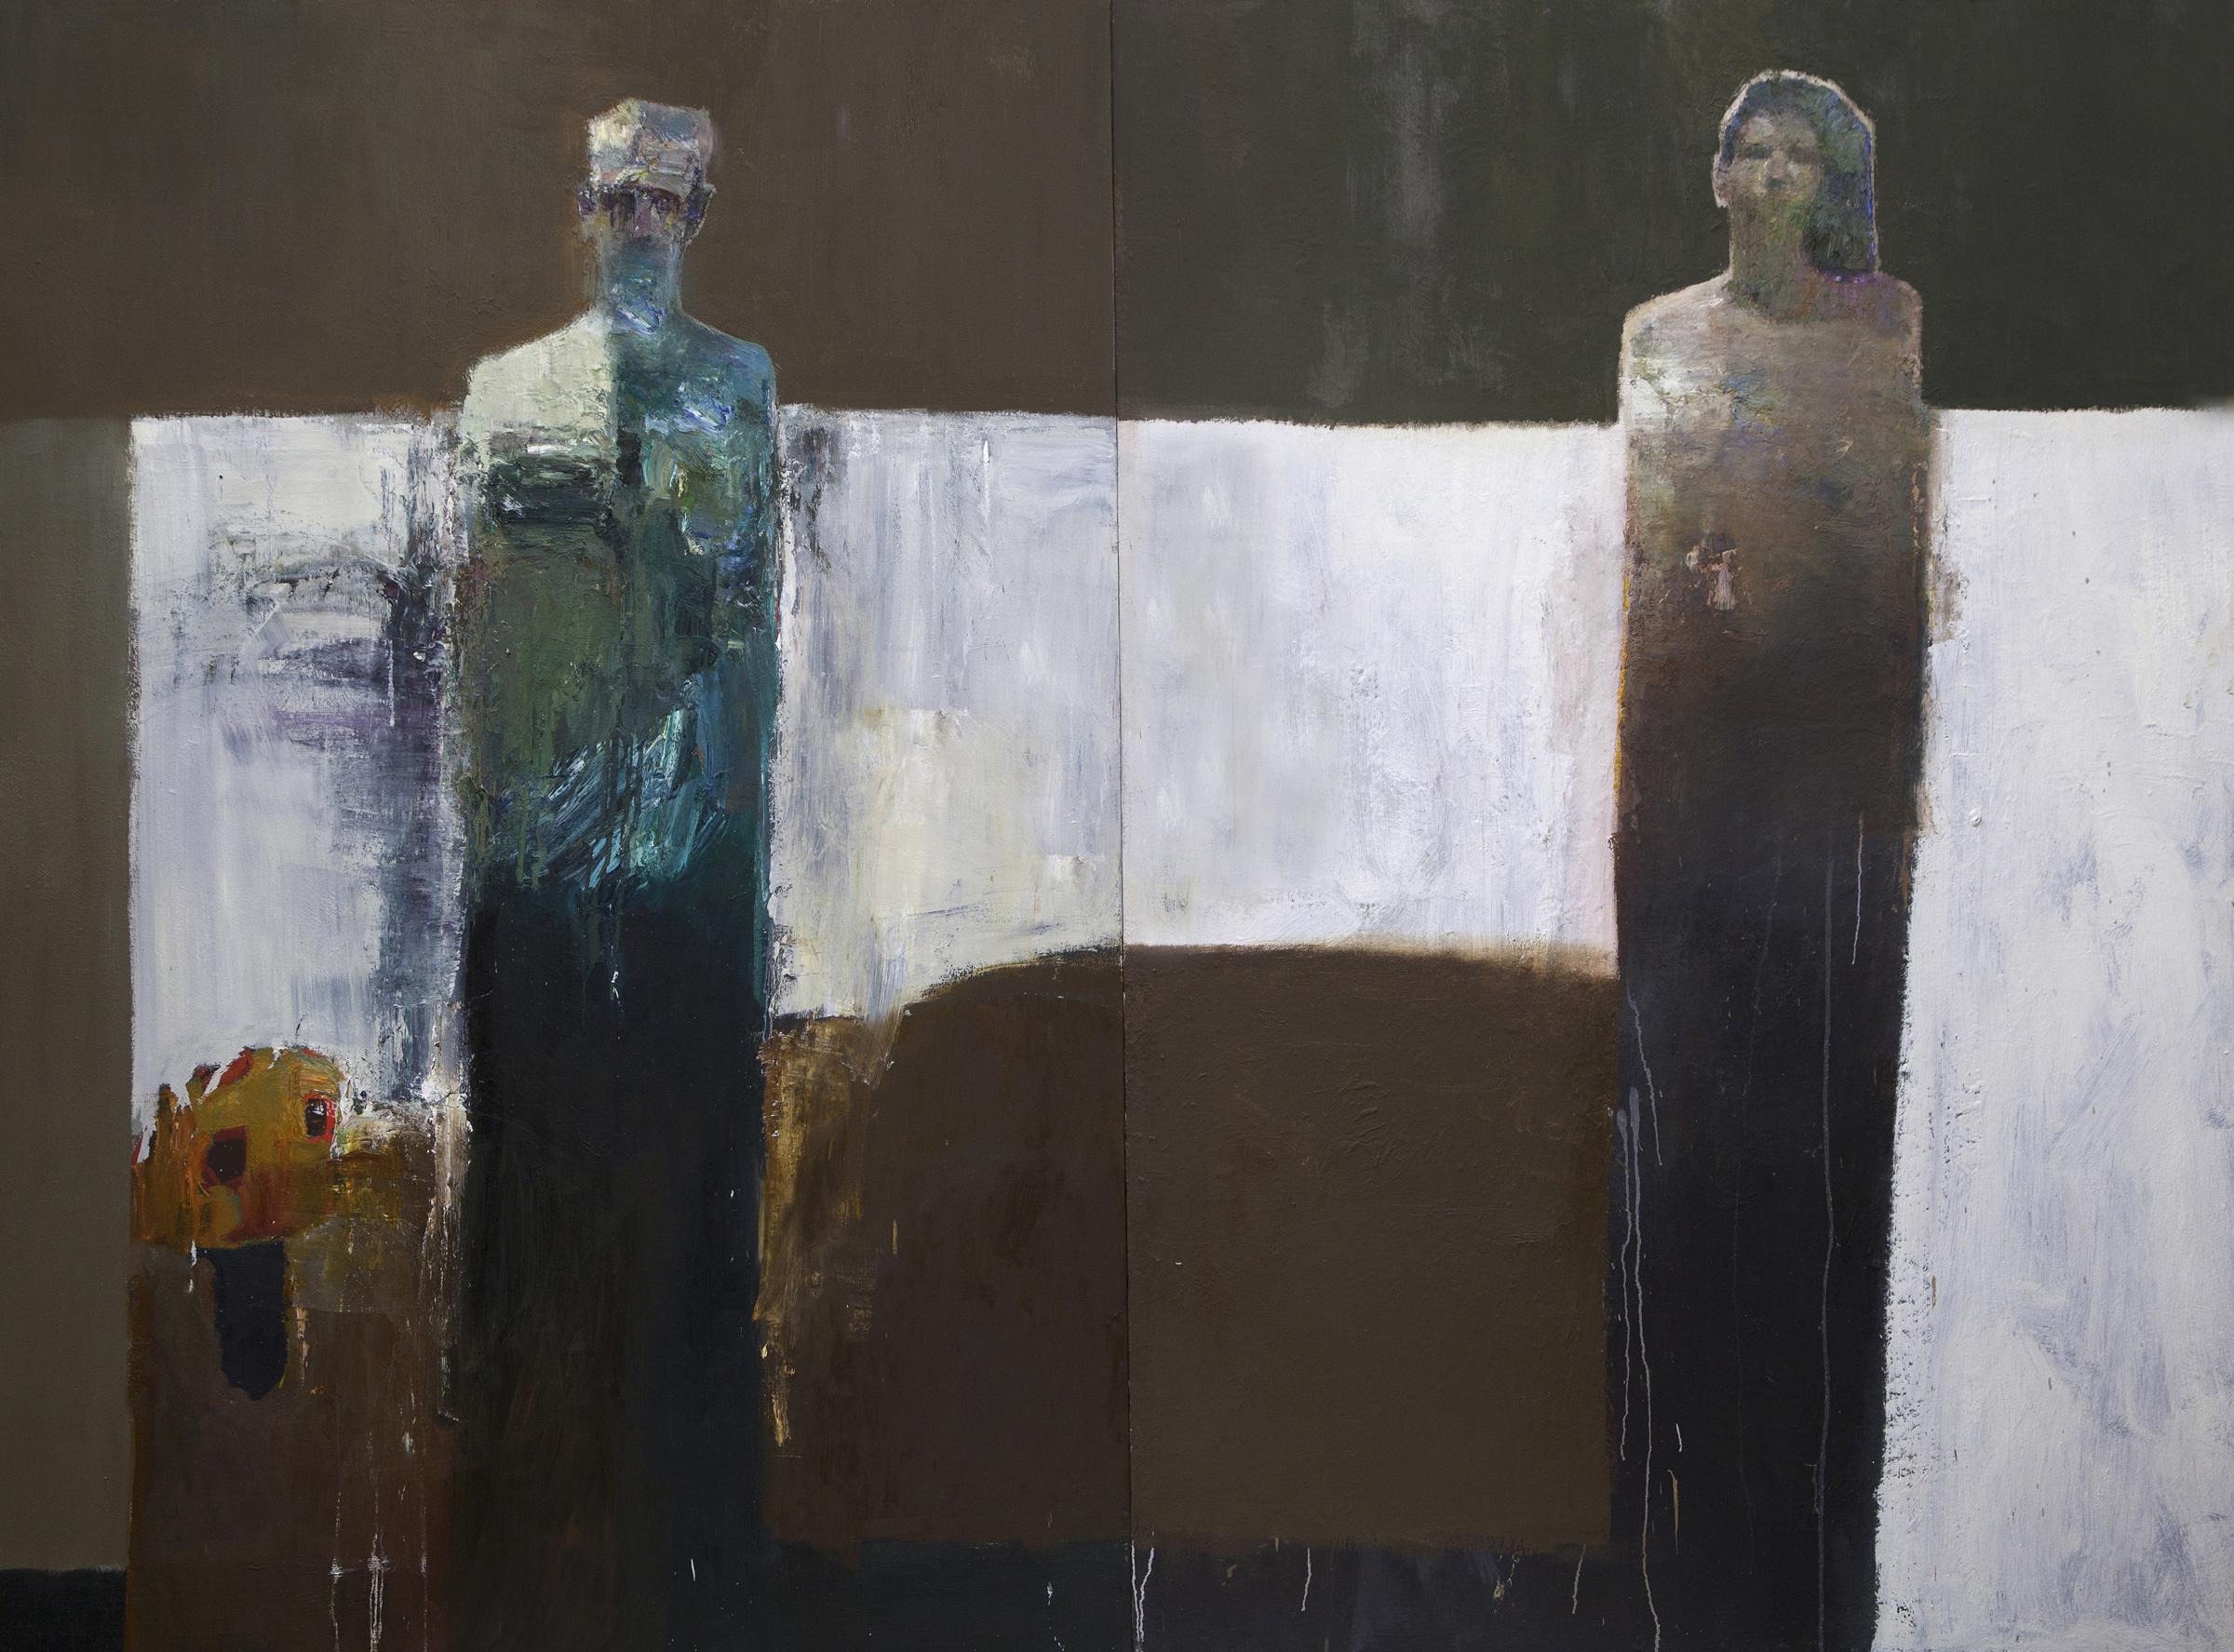 Interwoven 72x96 in. Oil on Canvas